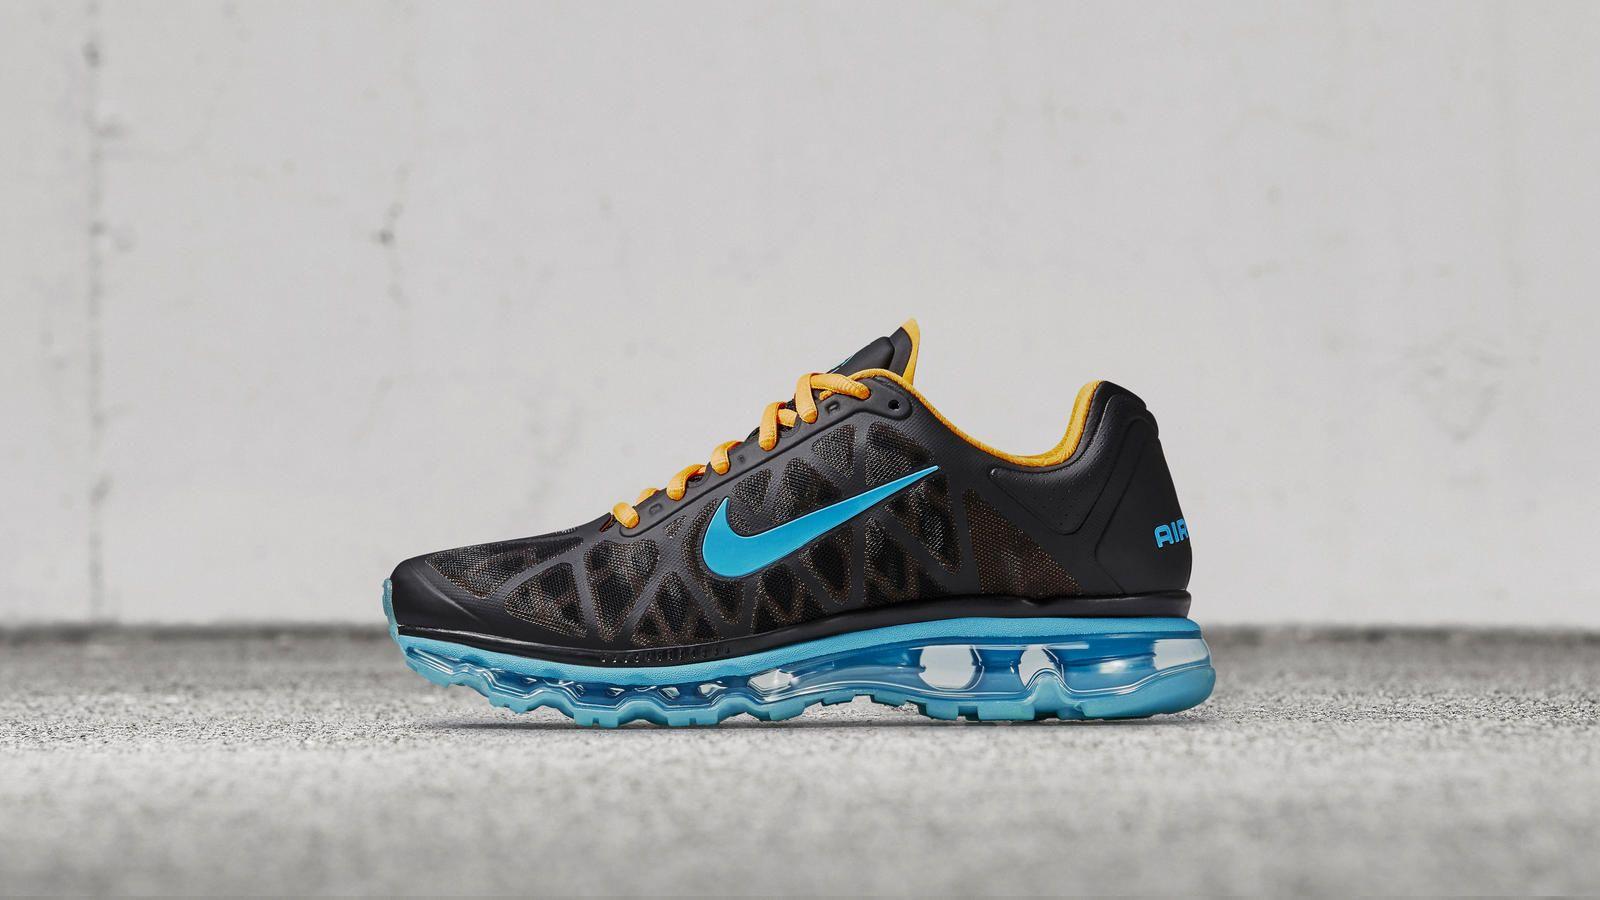 Nike Air Max 2011 N7 | Nike air max, Nike air max 2011, Nike